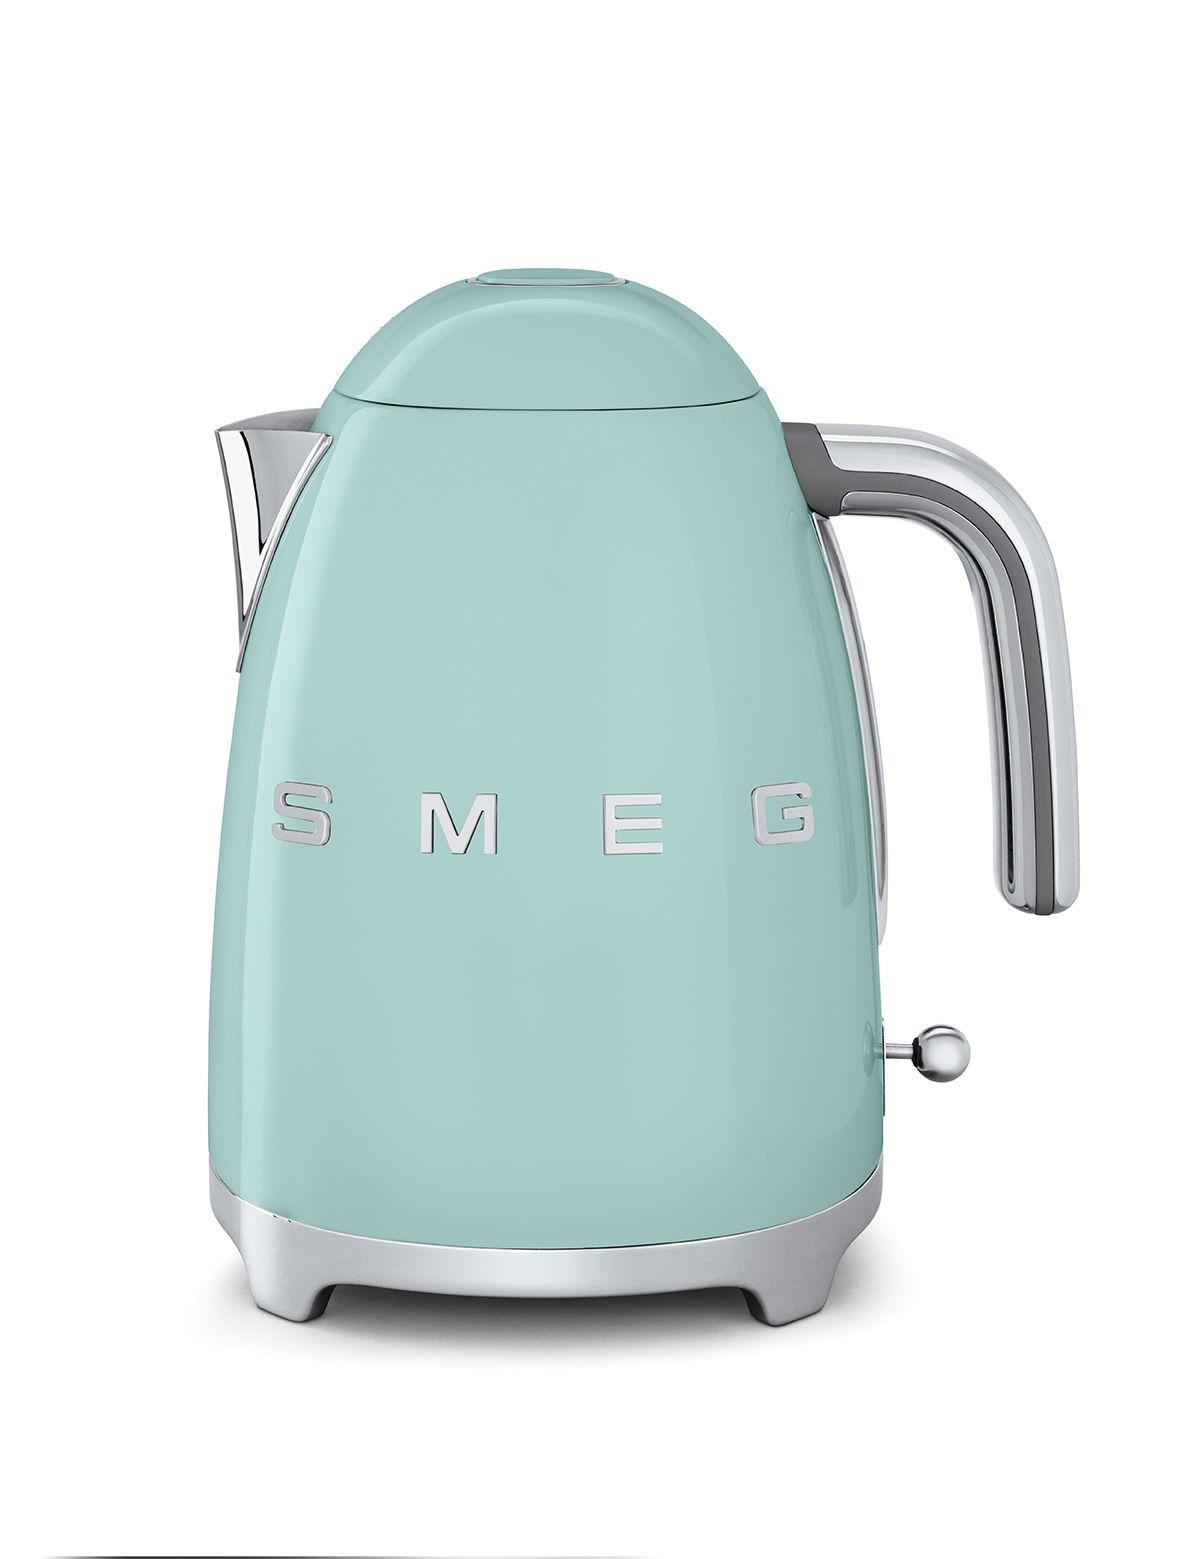 SMEG-Wasserkocher-mint | Wasserkocher | Pinterest | Wasserkocher ...